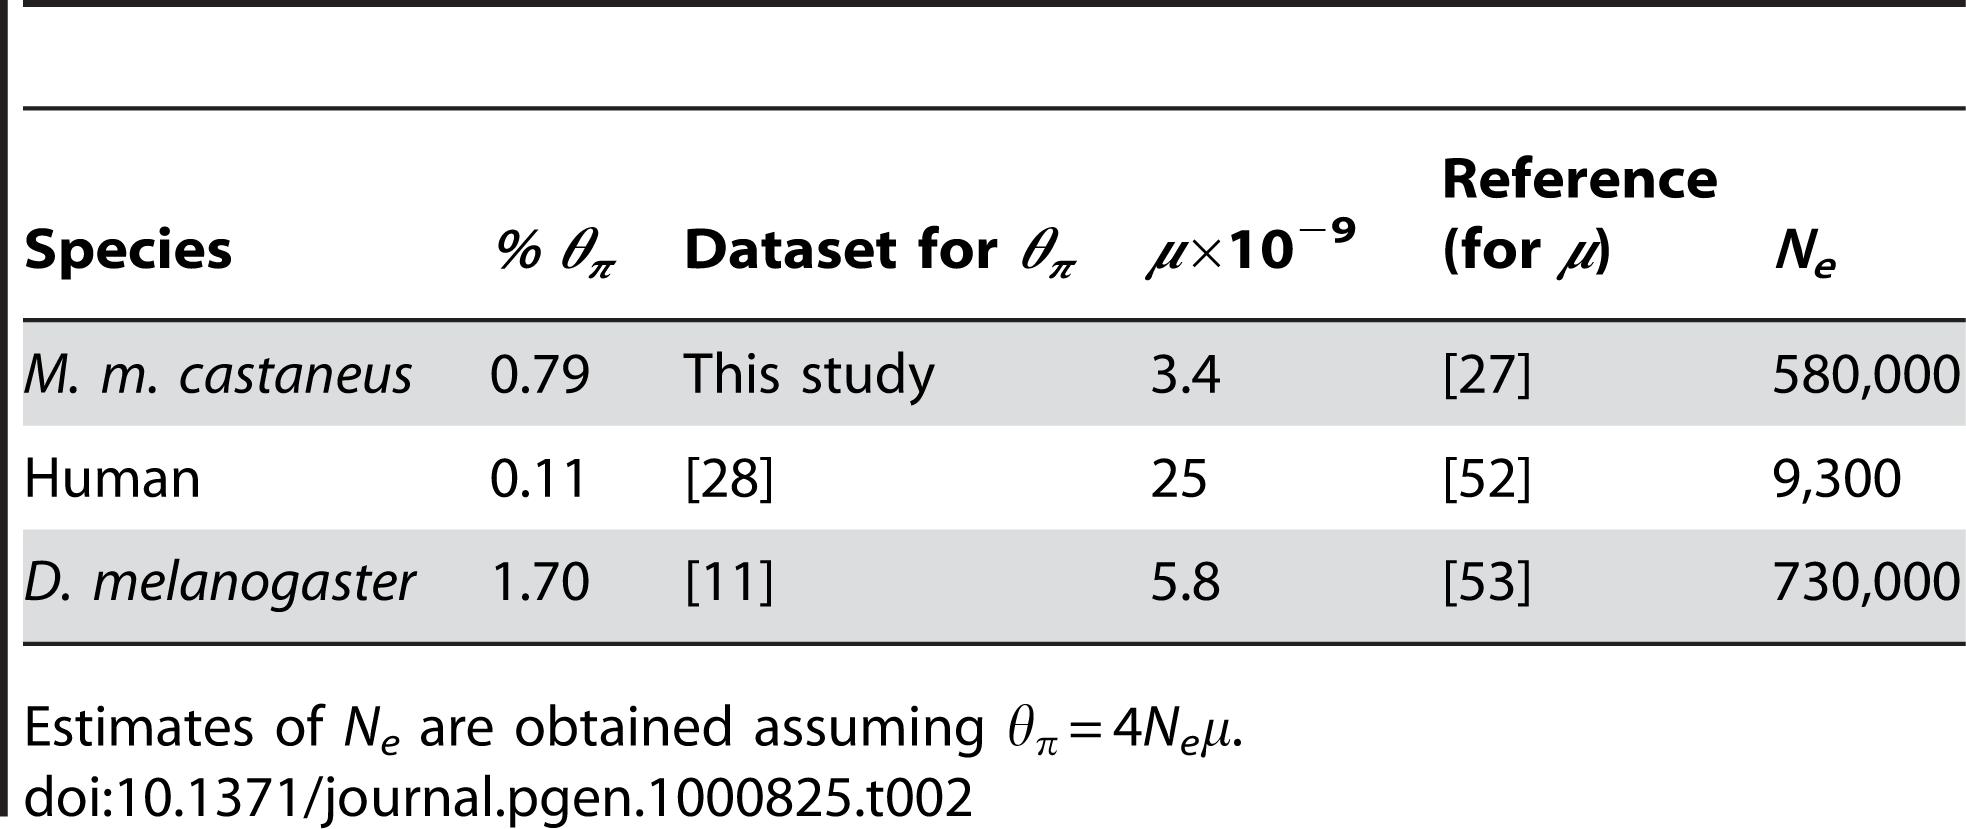 Estimates of percentage nucleotide diversity (<i>θ<sub>S</sub></i>) at 4-fold degenerate sites, the per nucleotide site mutation rate per generation (<i>μ</i>), and recent <i>N<sub>e</sub></i> in <i>M. m. castaneus</i>, African humans, and African <i>D. melanogaster</i>.